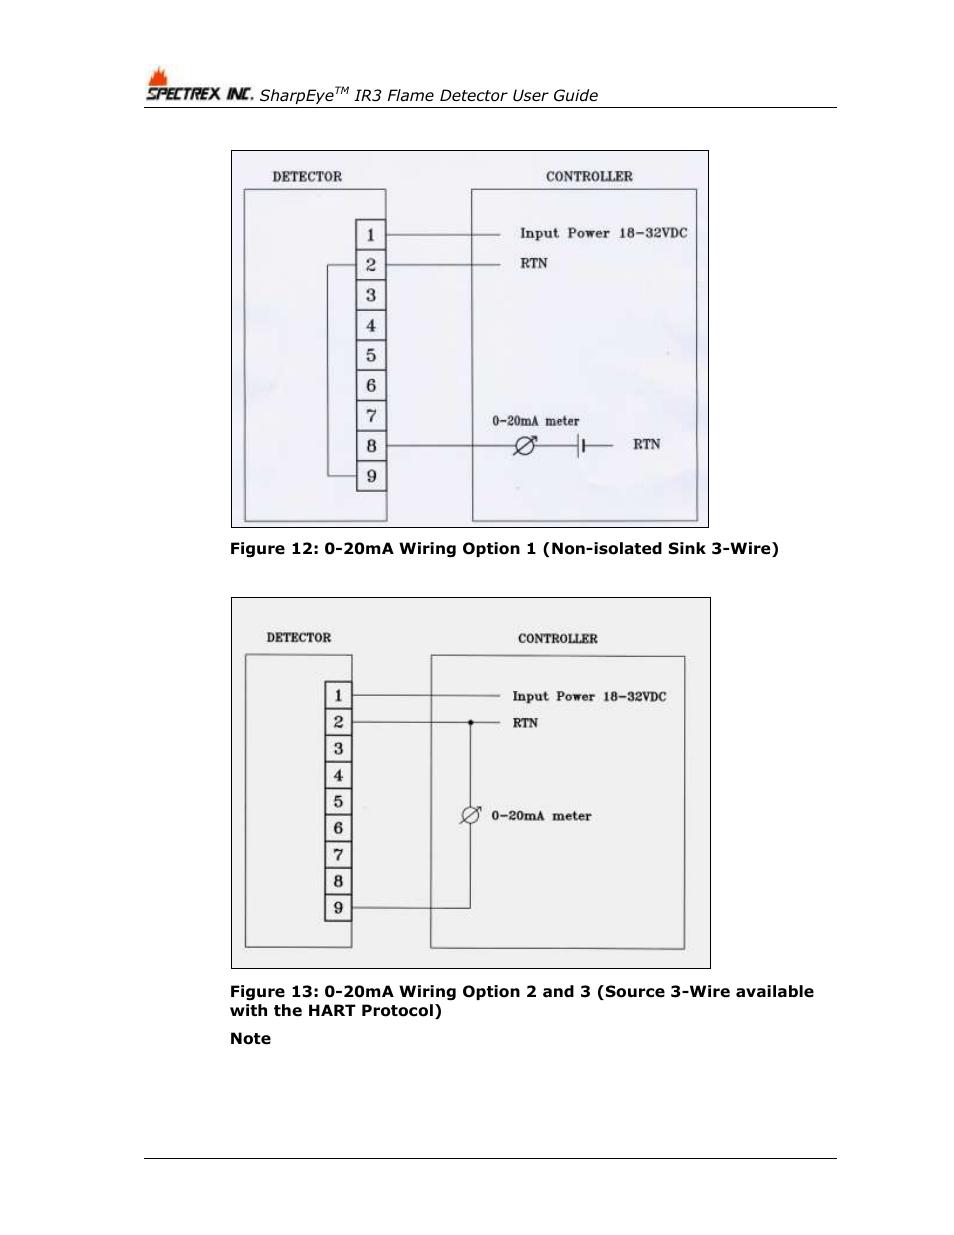 medium resolution of figure 12 figure 13 spectrex 40 40i triple ir ir3 flame detector user manual page 66 80